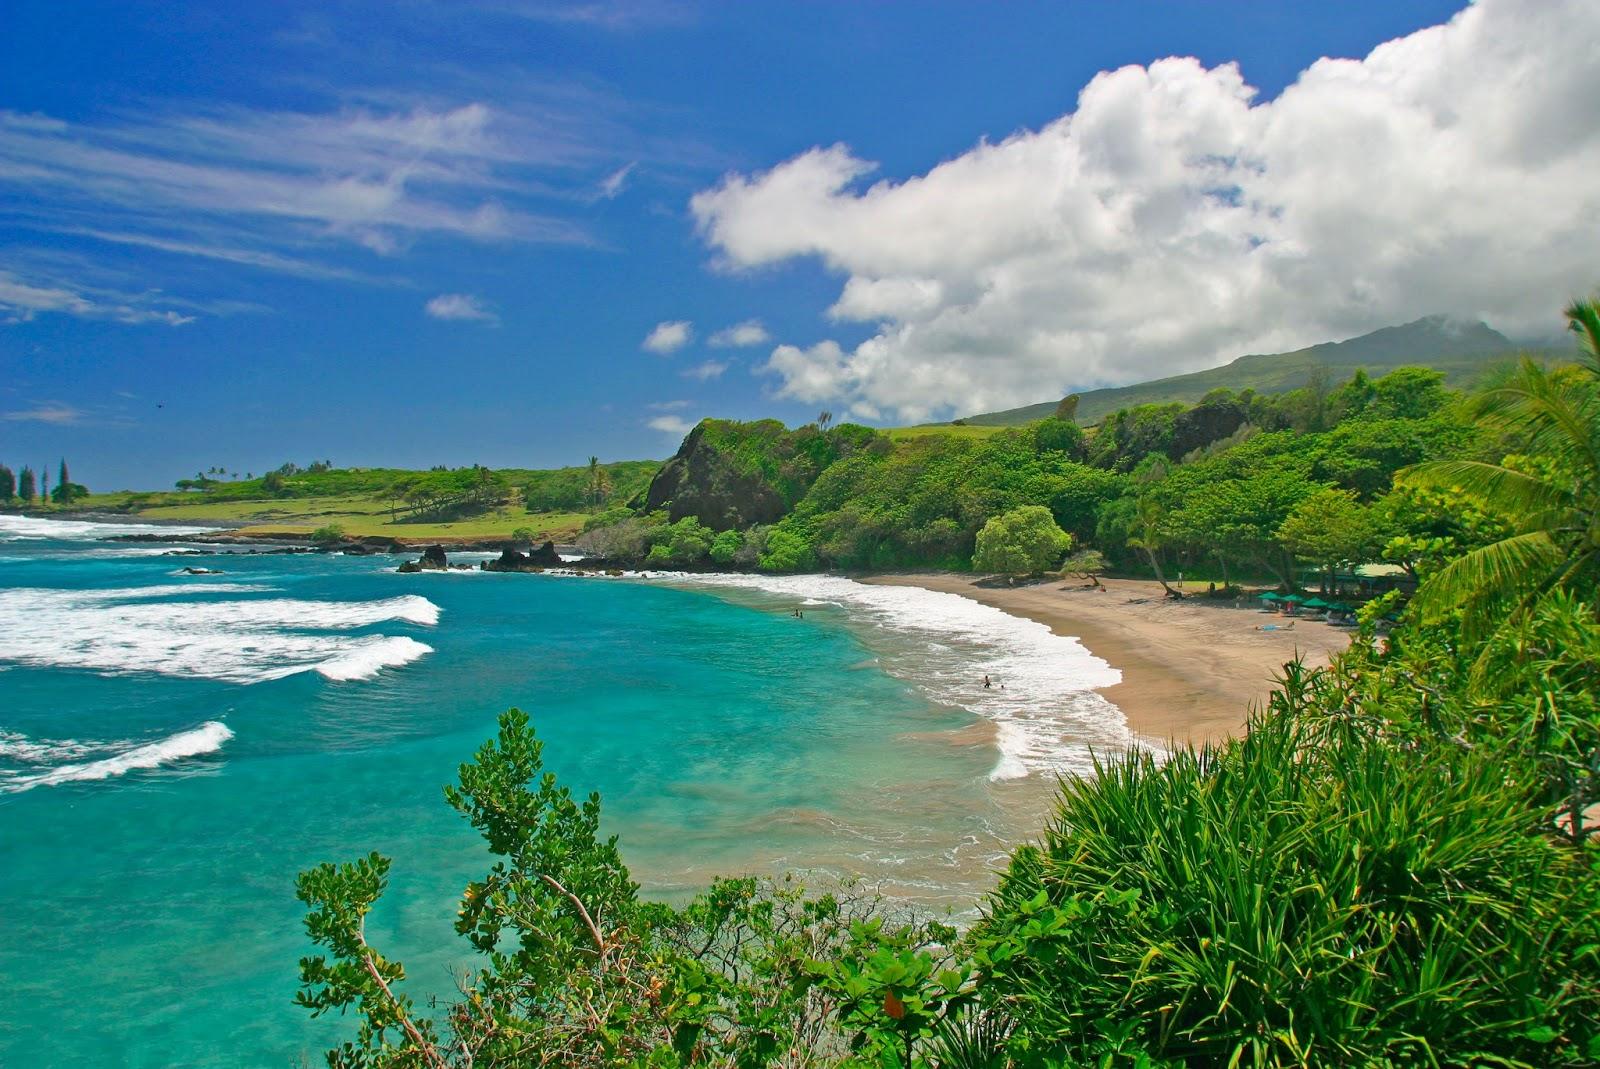 Maui Beautiful Island Travel Information Latest Photos